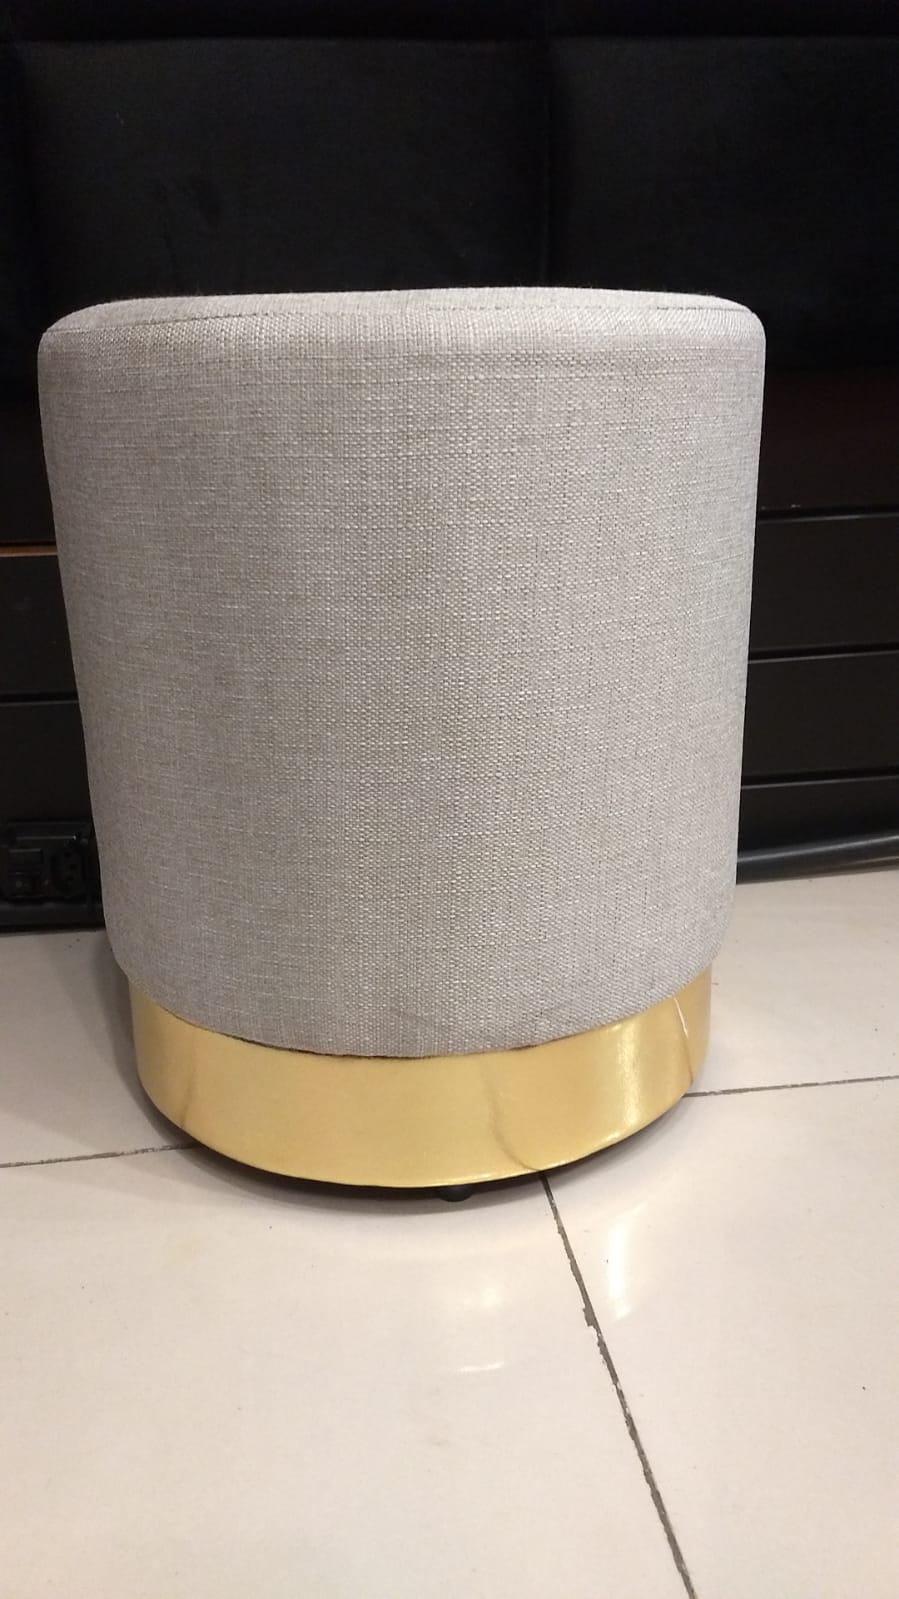 Puff GOLDEN (com base dourada)